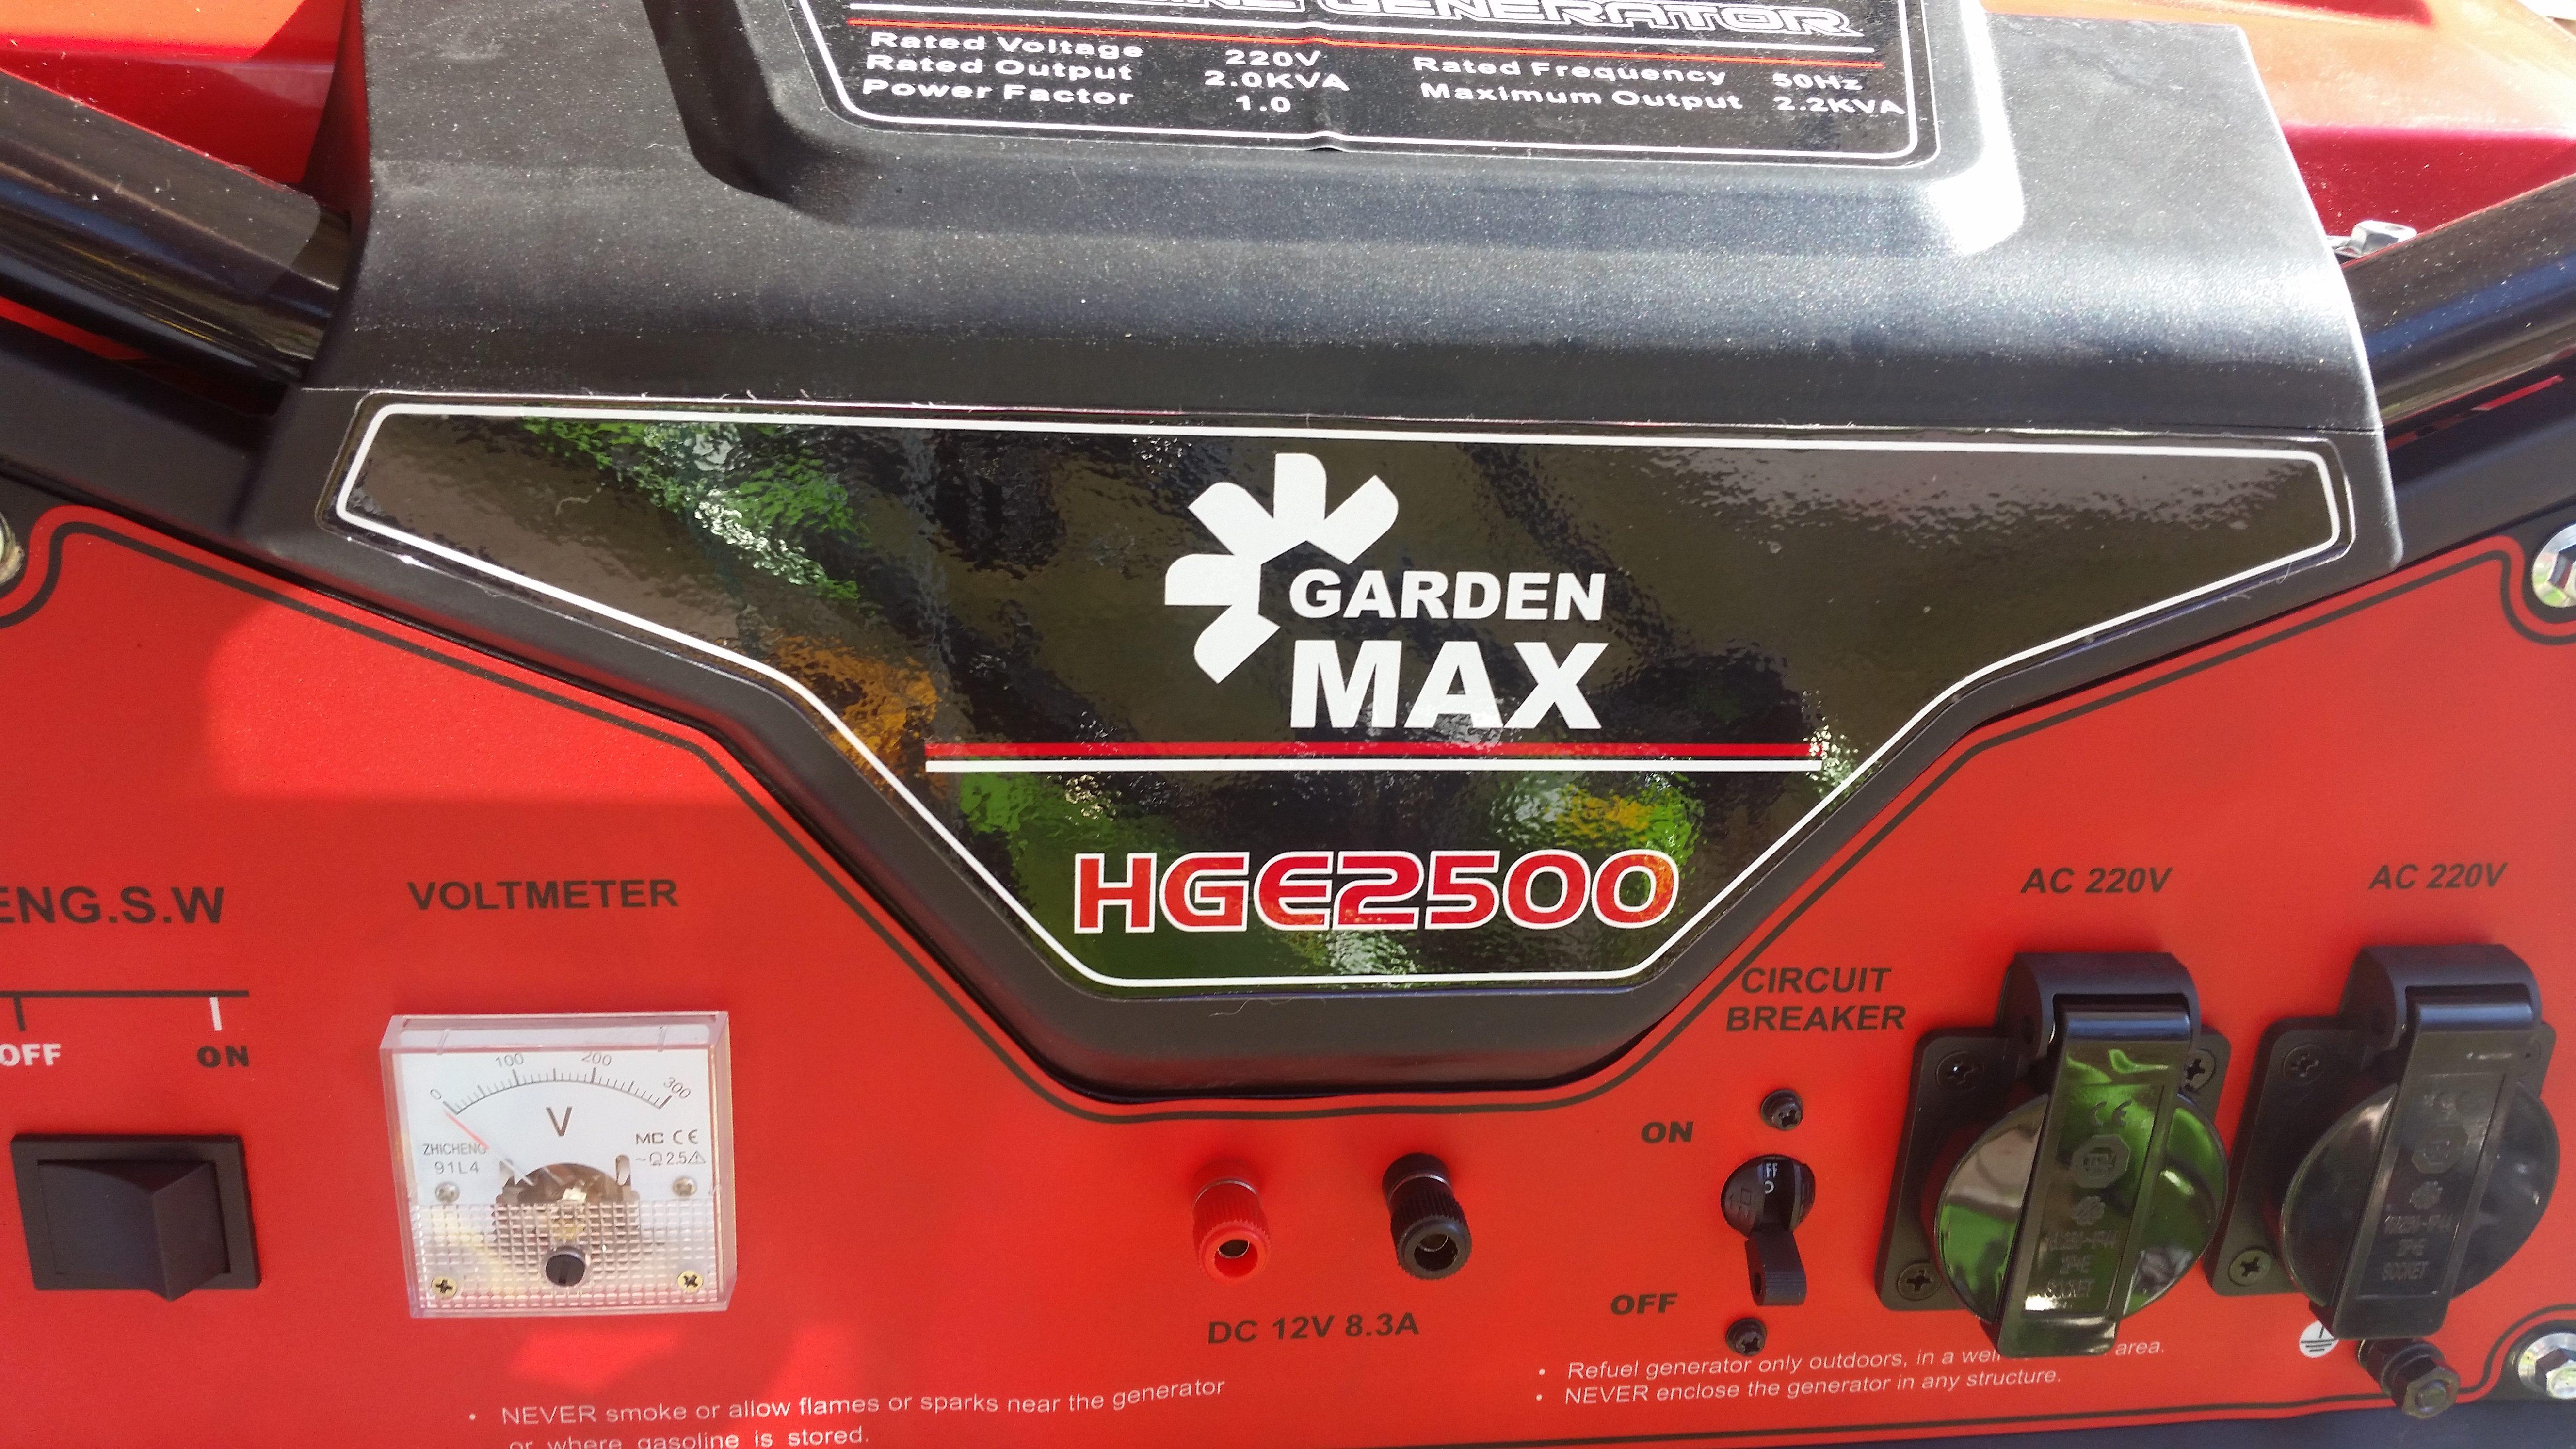 GardenMAX HGE2500